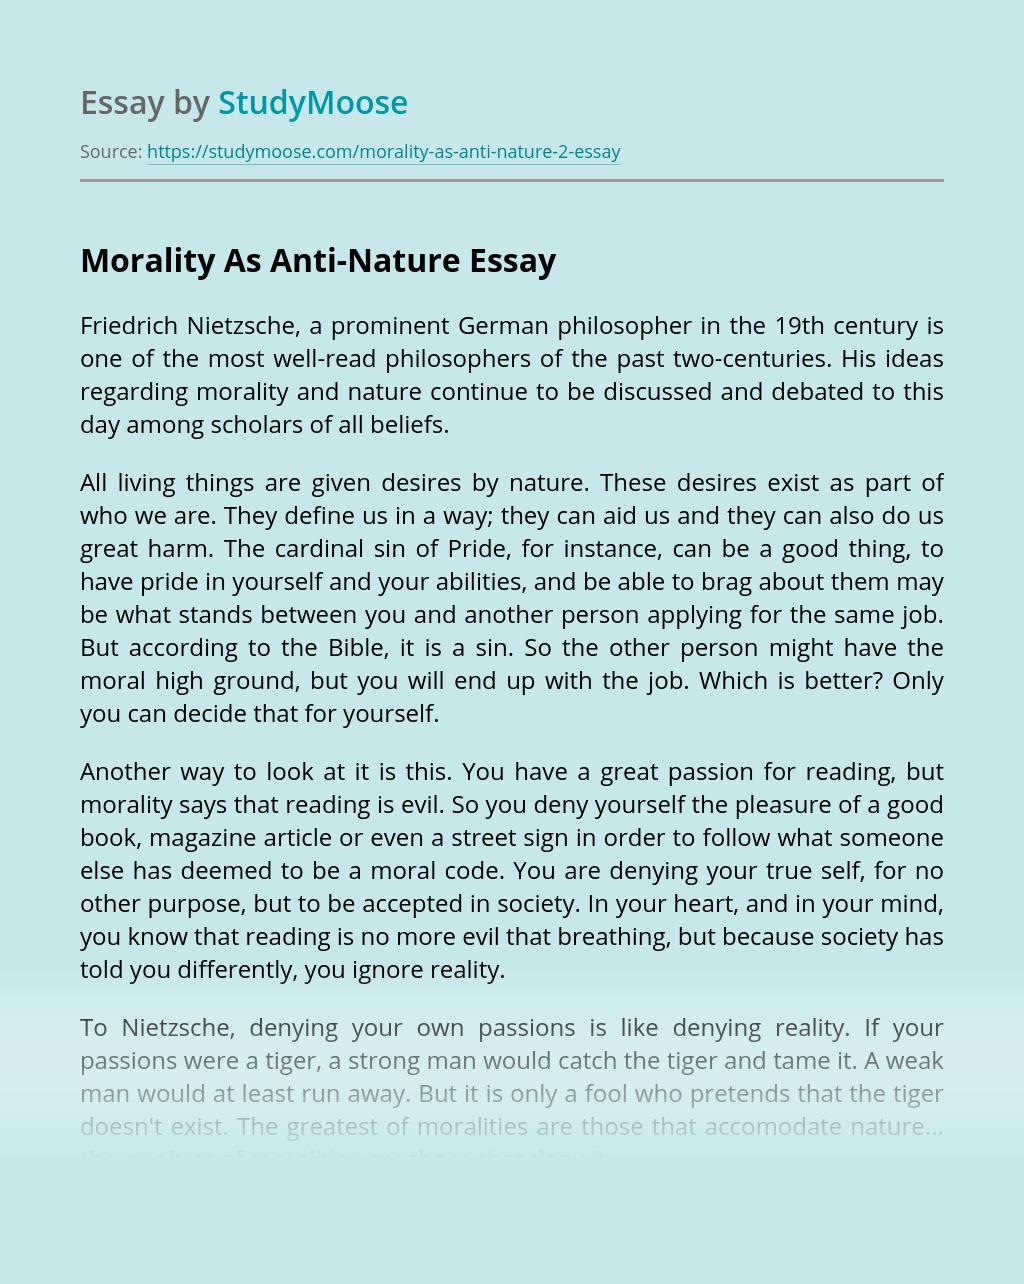 Morality As Anti-Nature